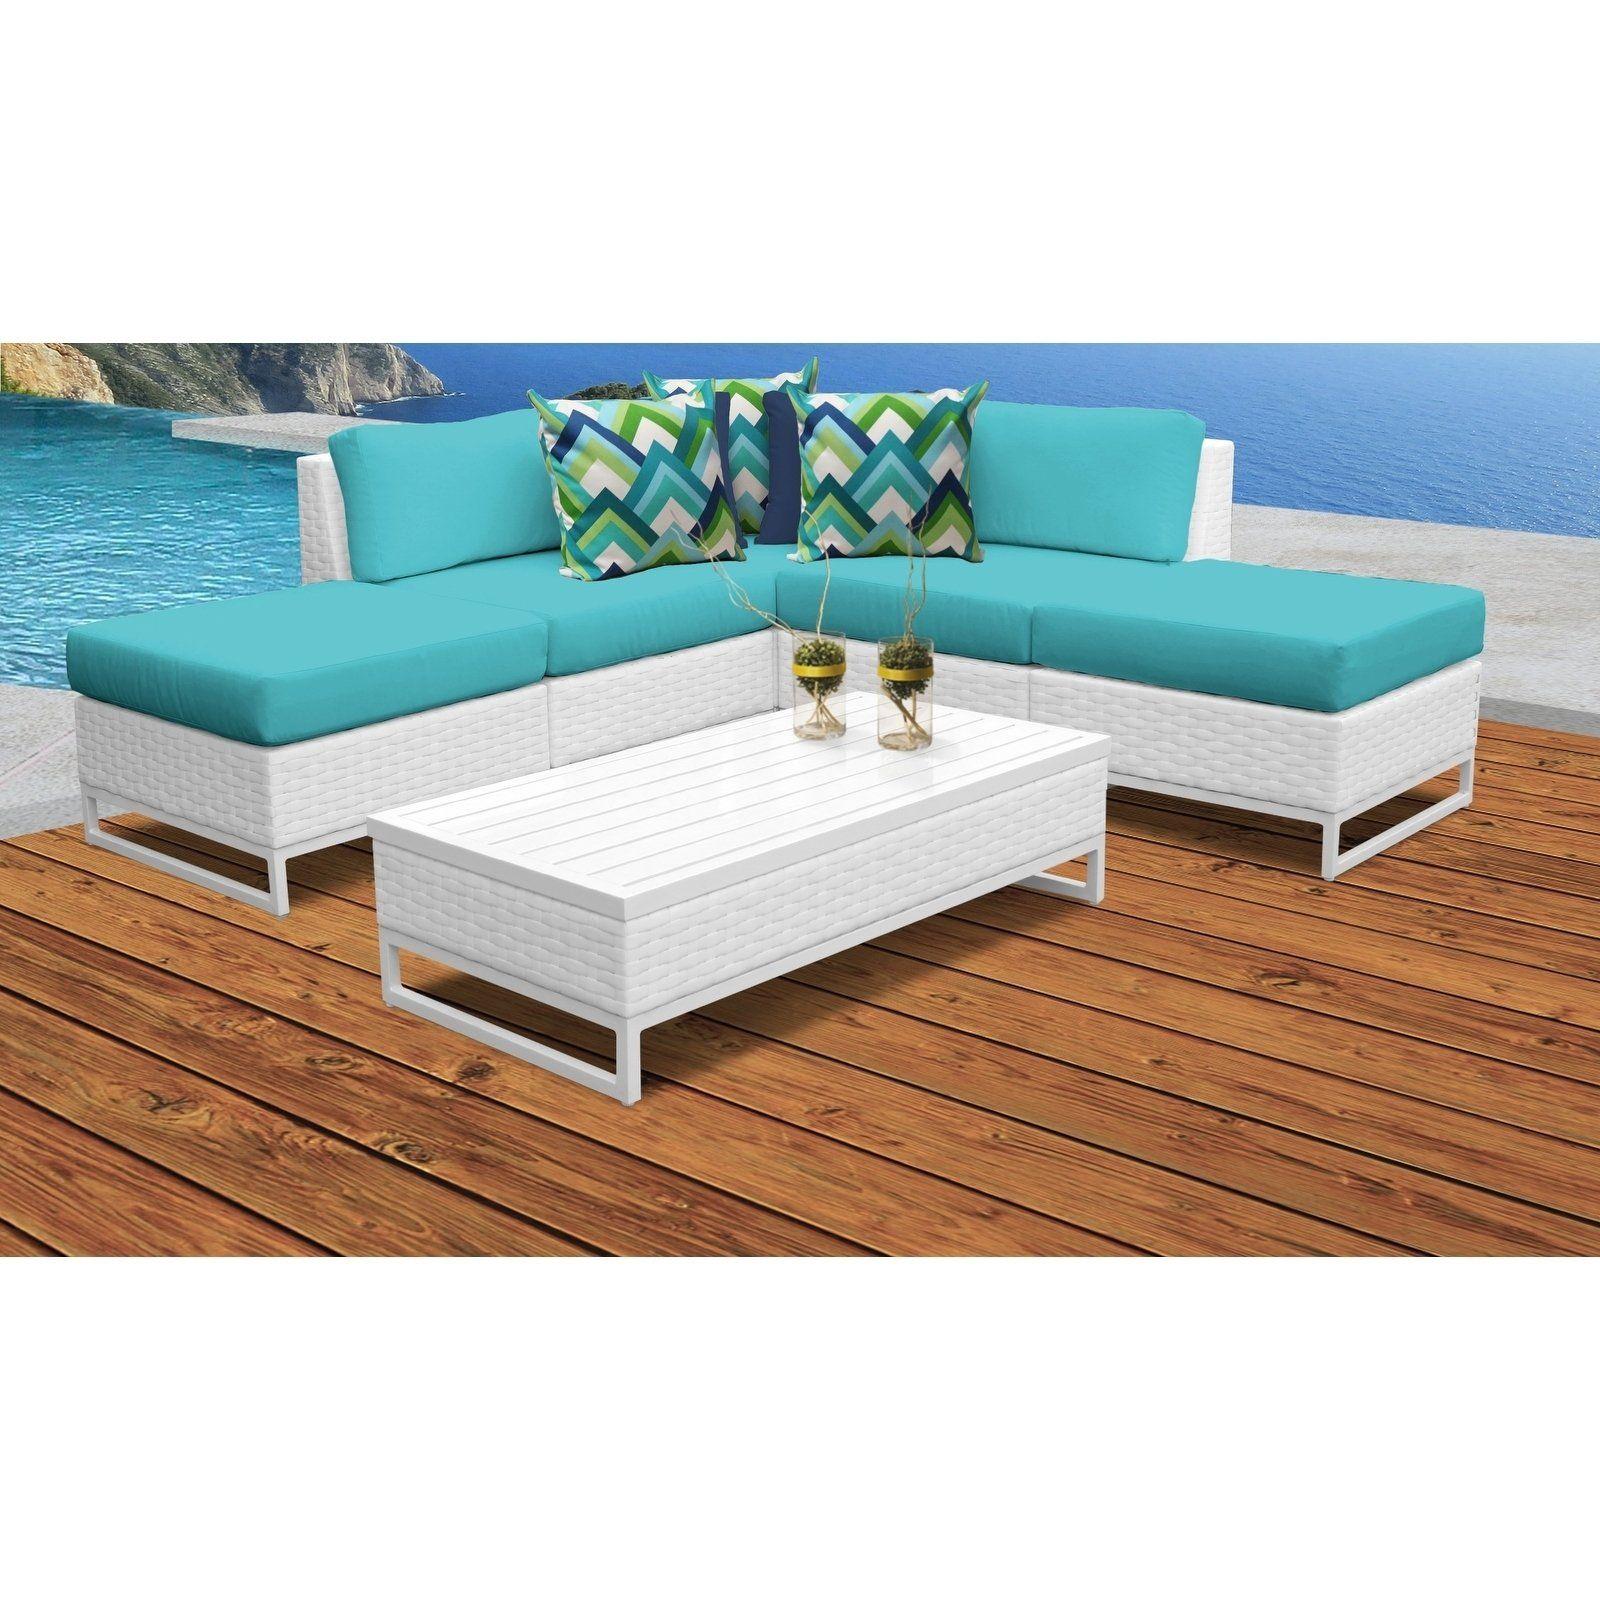 Miami 6 Piece Outdoor Wicker Patio Furniture Set 06c Aruba Tk